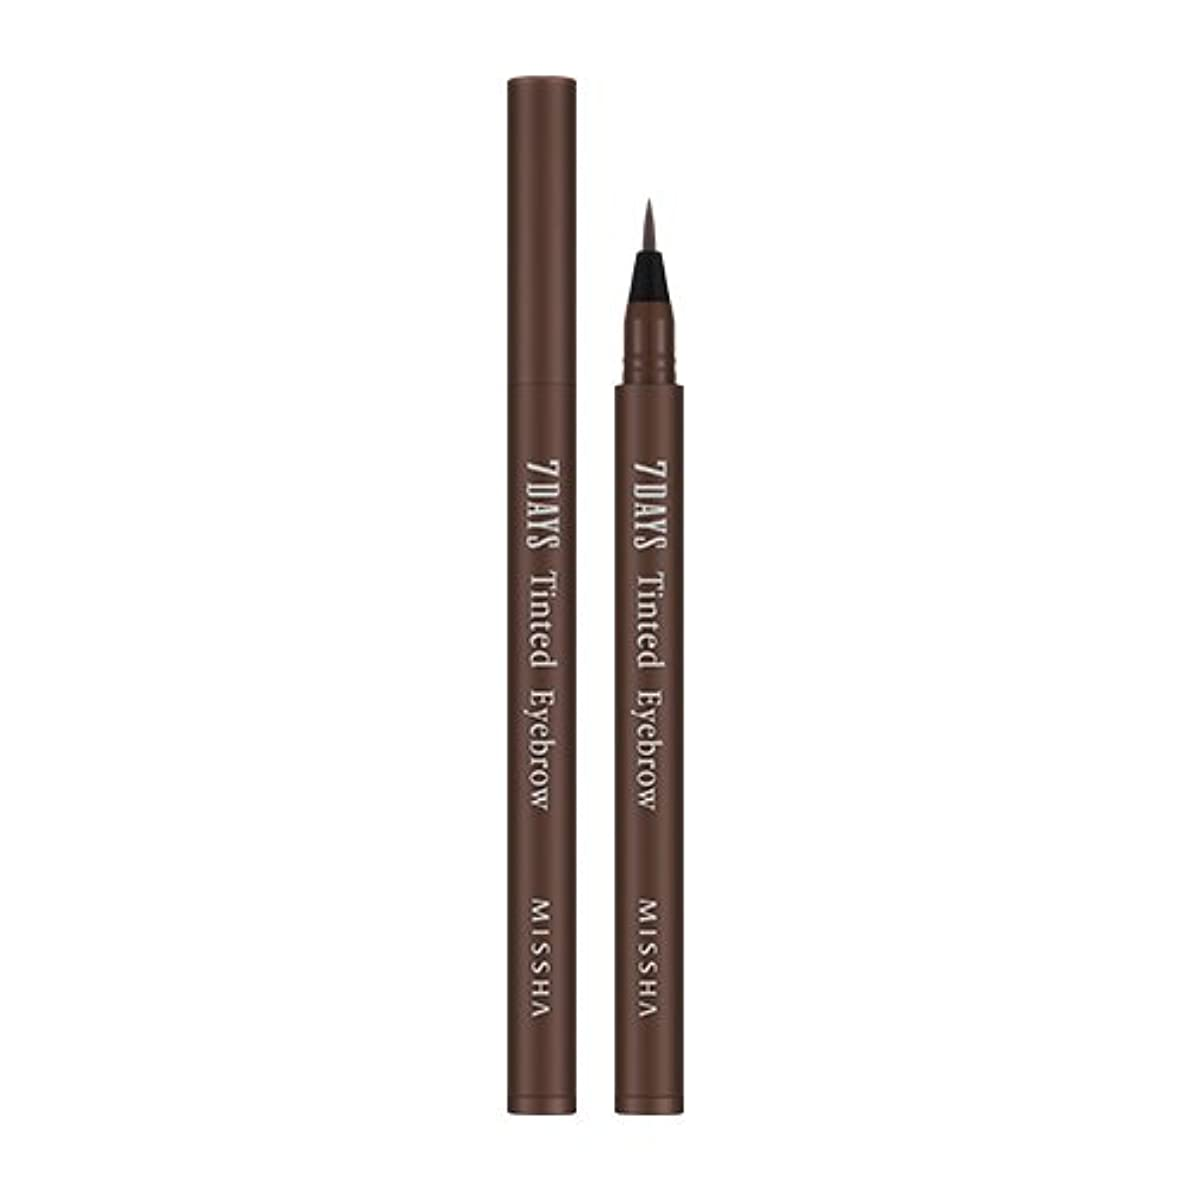 MISSHA Seven Days Tinted Eye Brow 0.8ml (#02 Sinopia Brown)/ミシャ セブンデイズ ティンテッド アイブロウ 0.8ml (#02 Sinopia Brown)